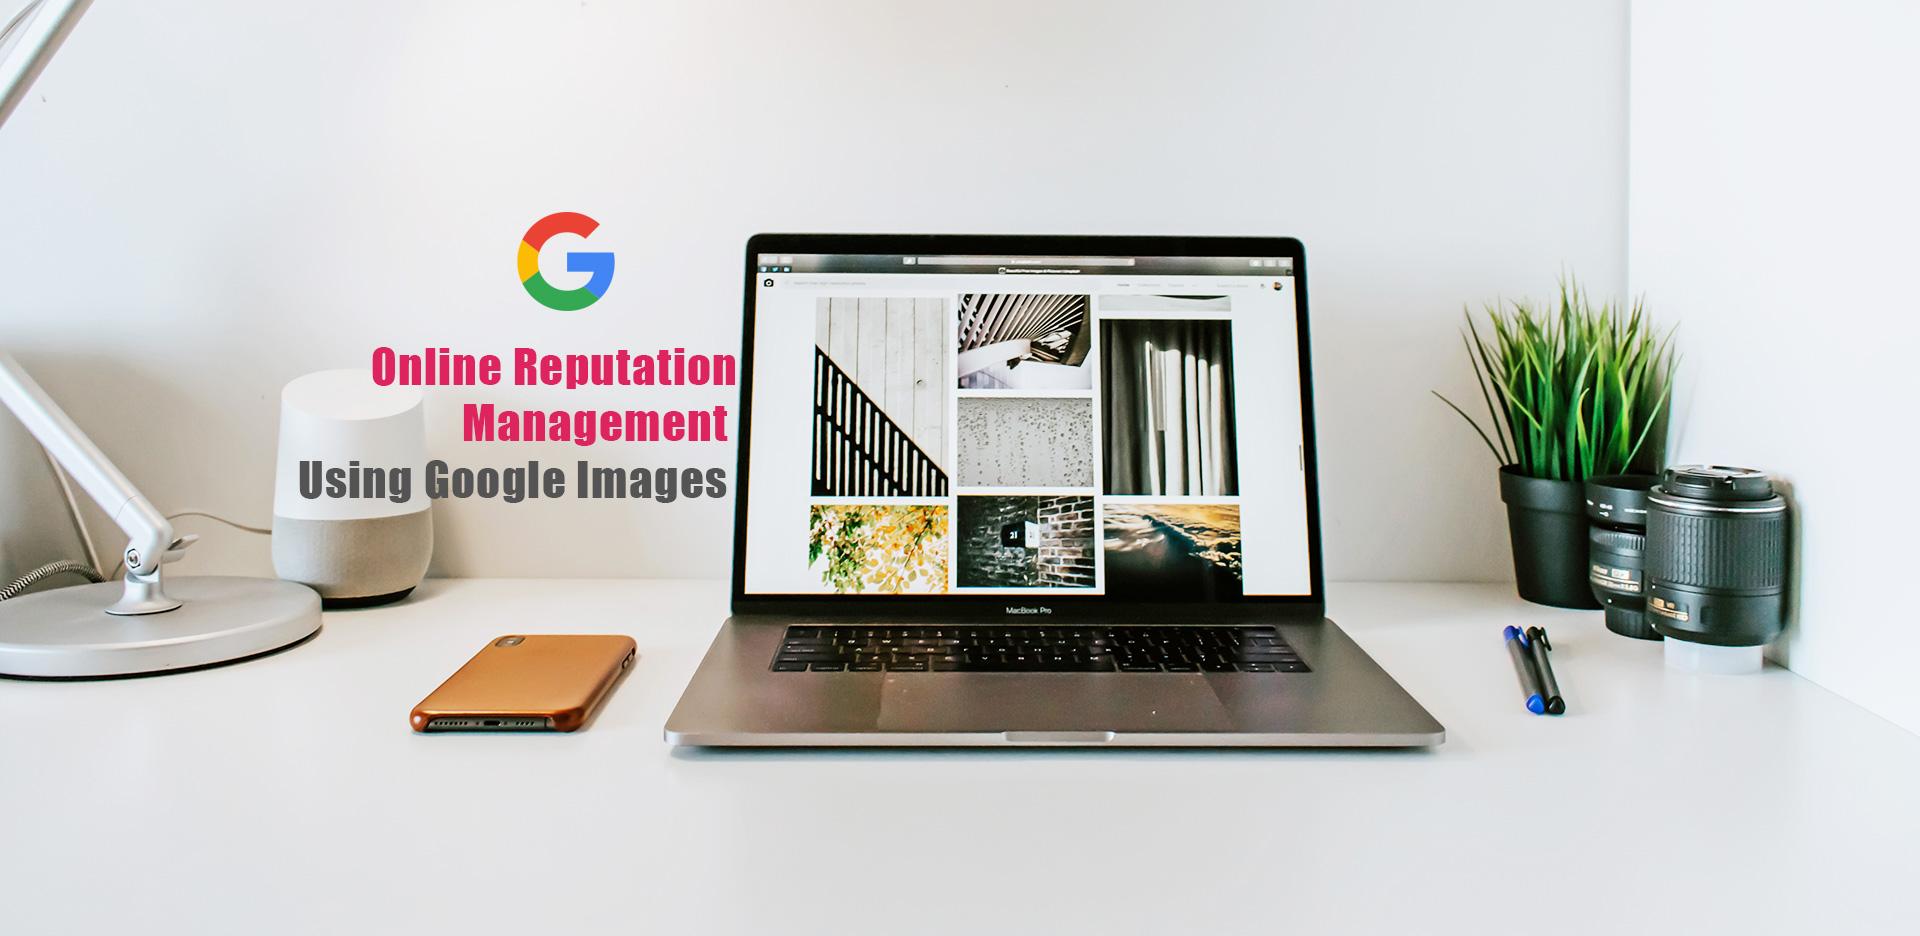 Online Reputation Management Using Google Images